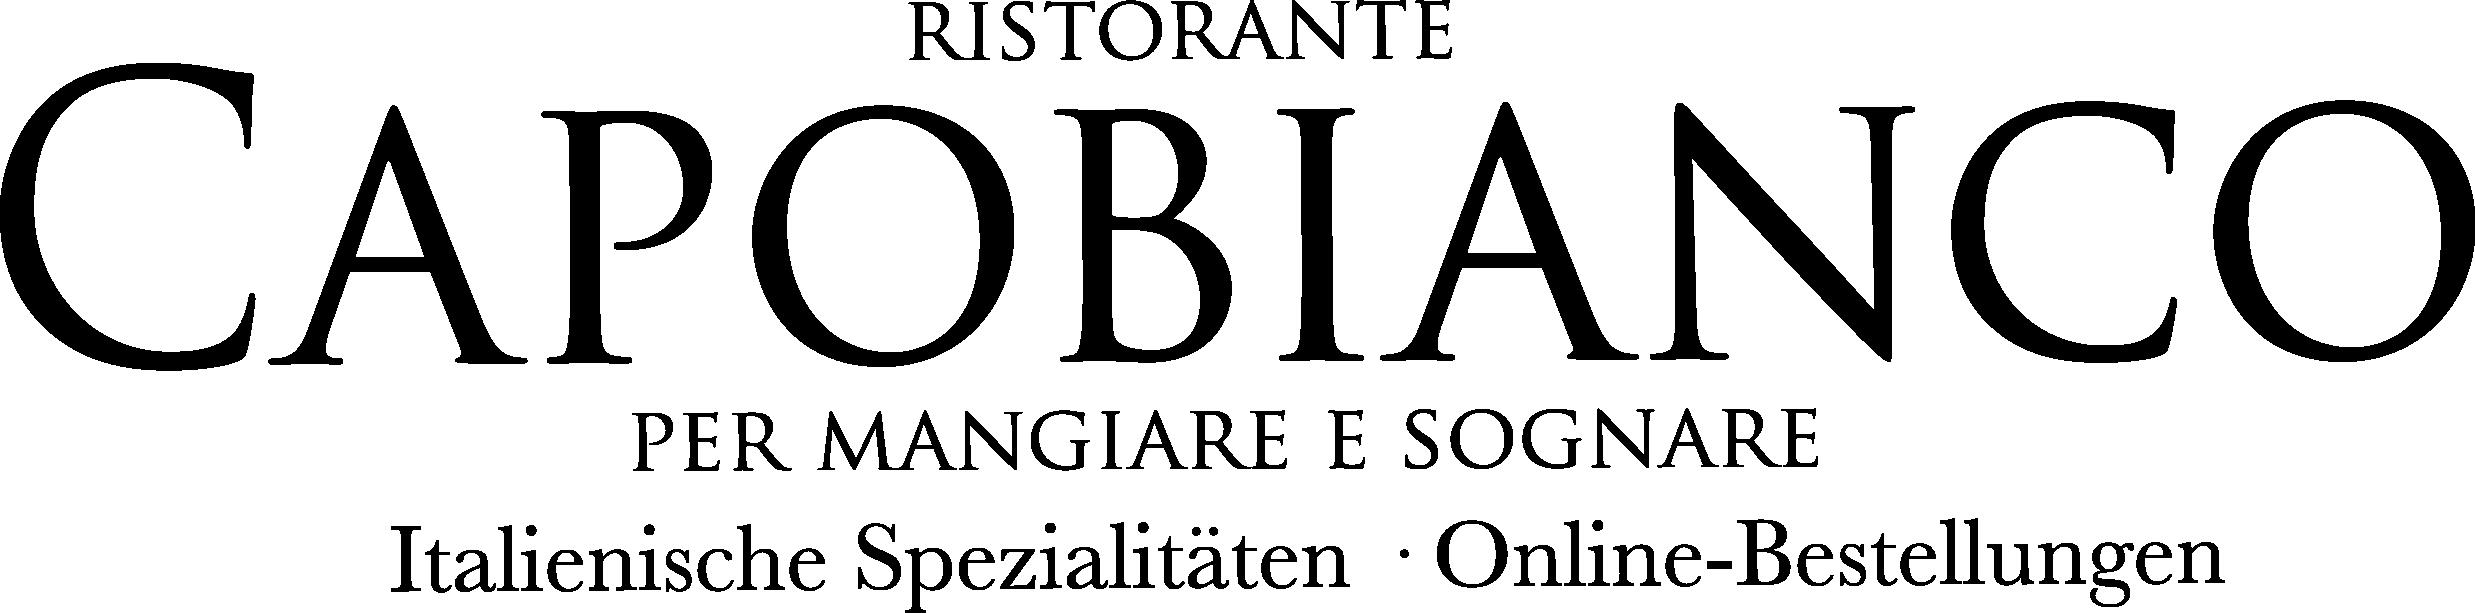 Spezialitäten Capobianco